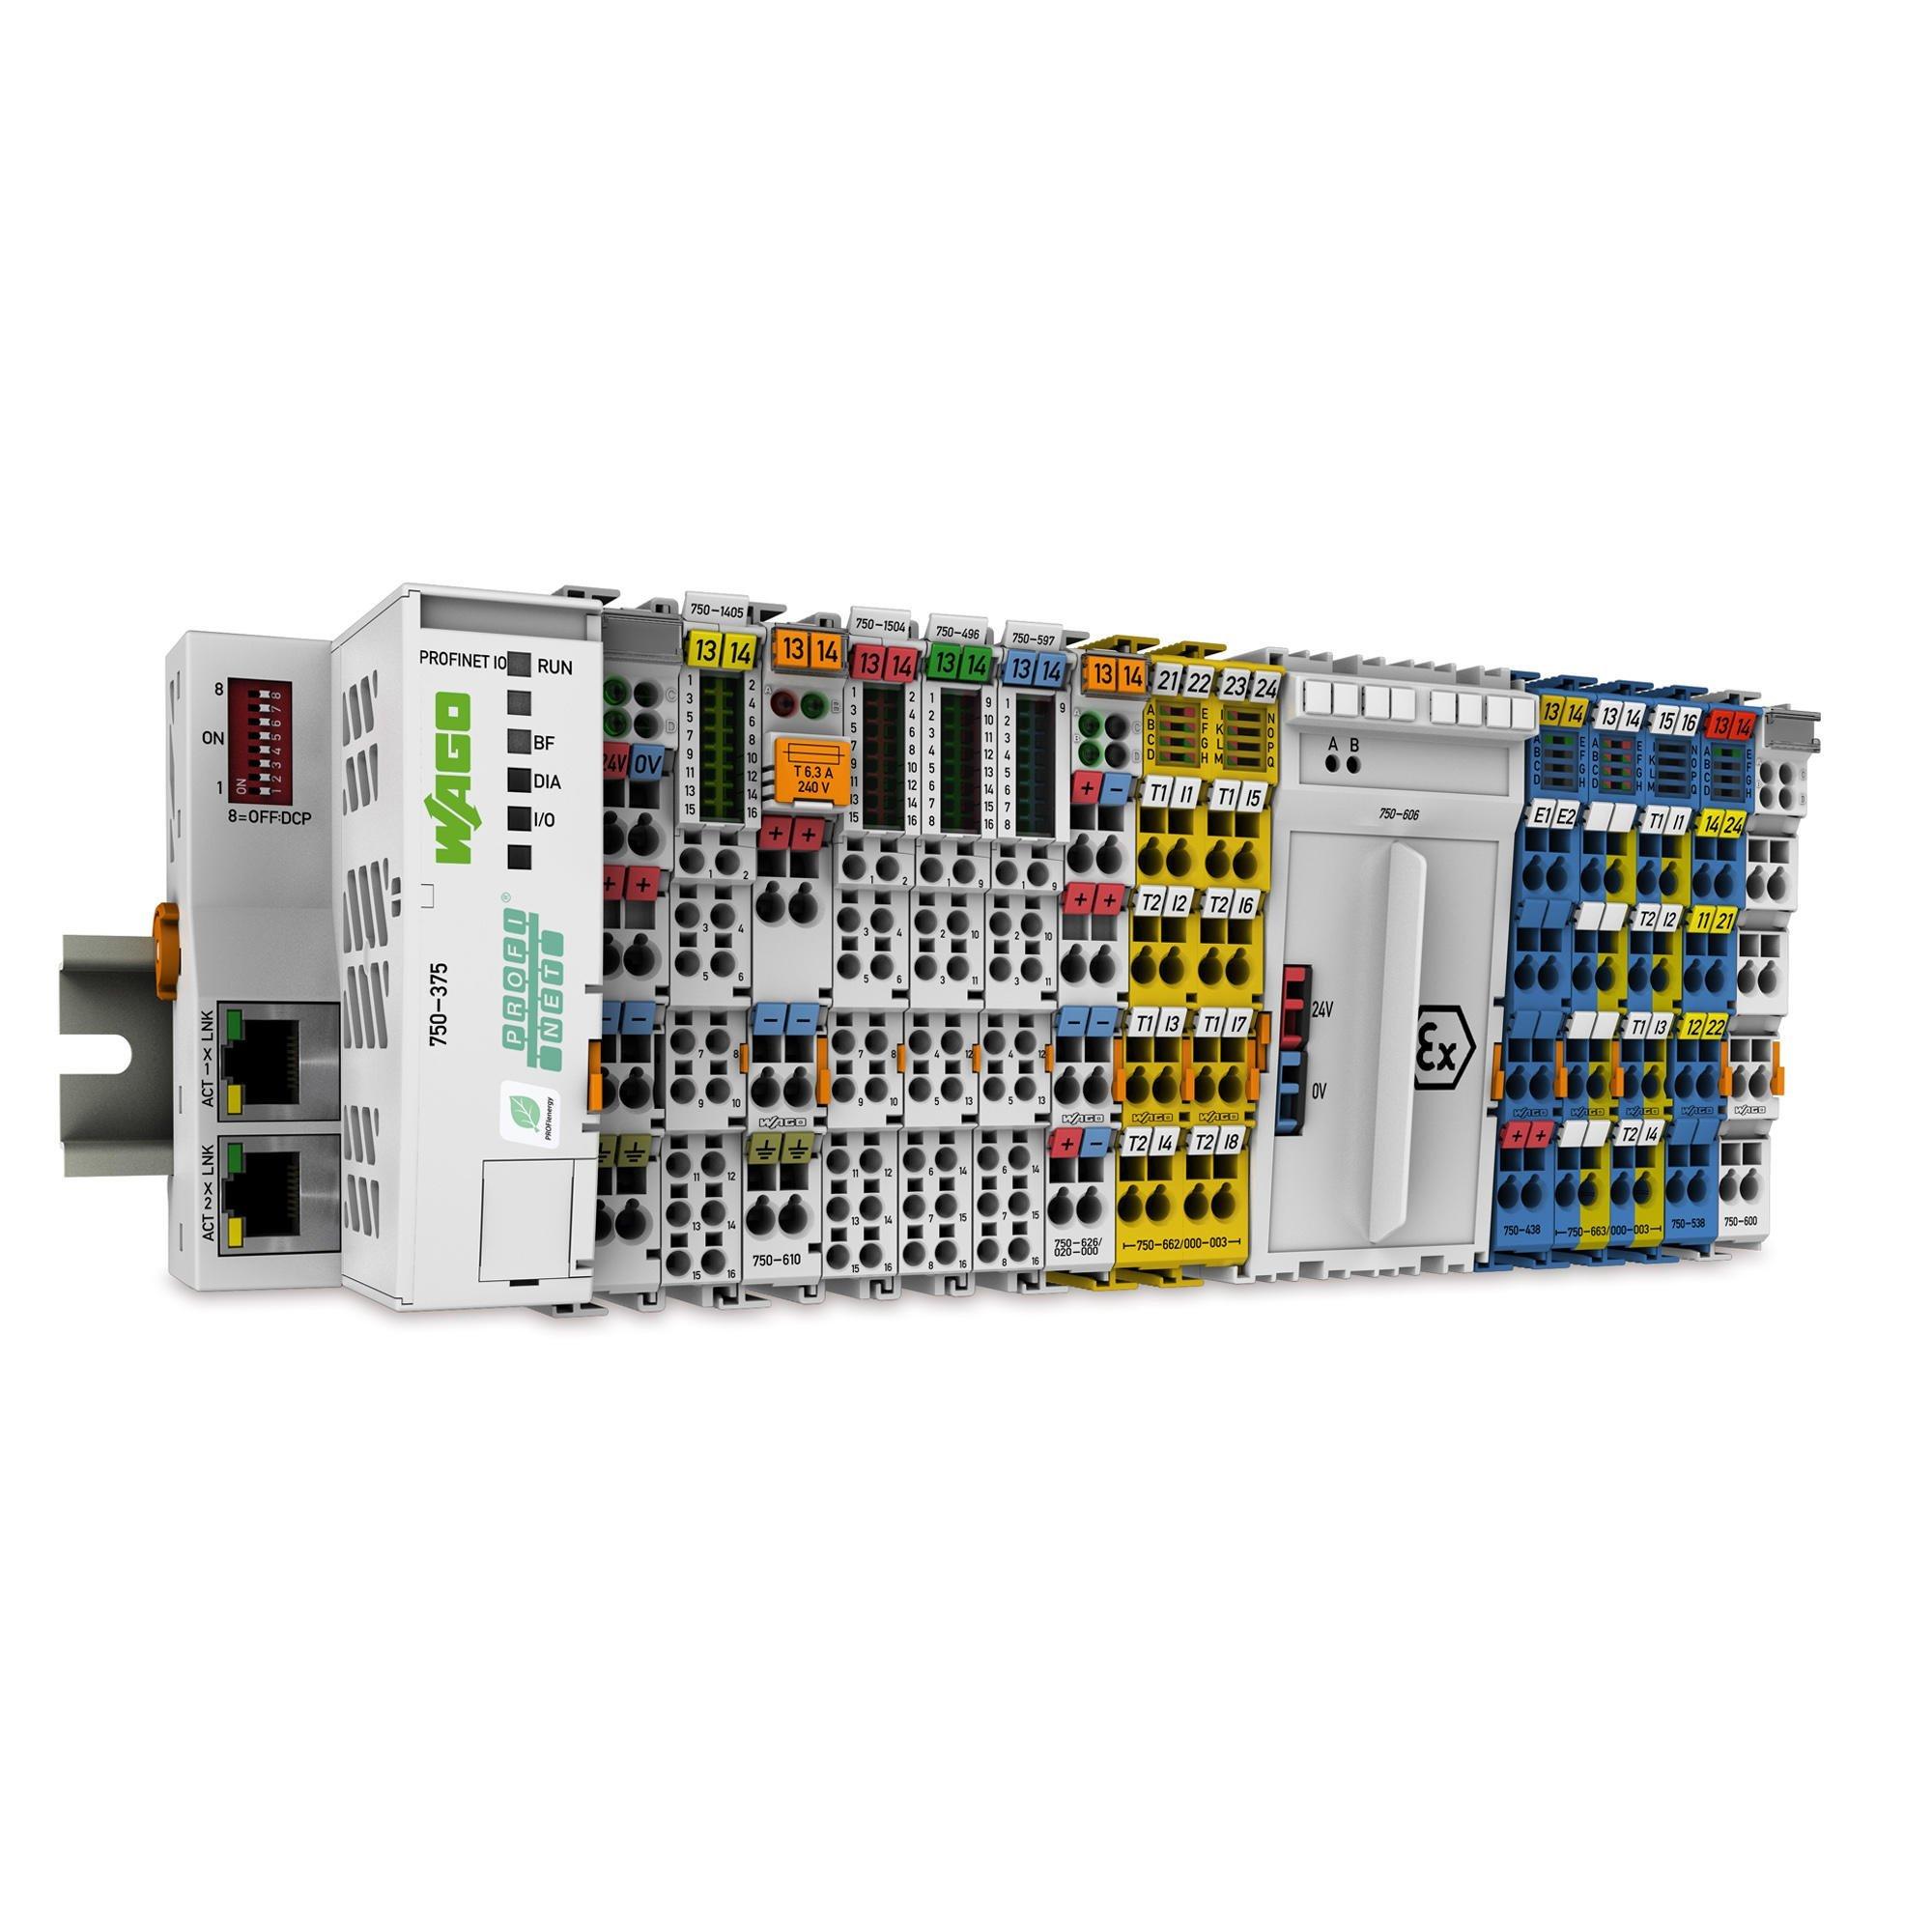 WAGO-I/O-SYSTEM 750/753